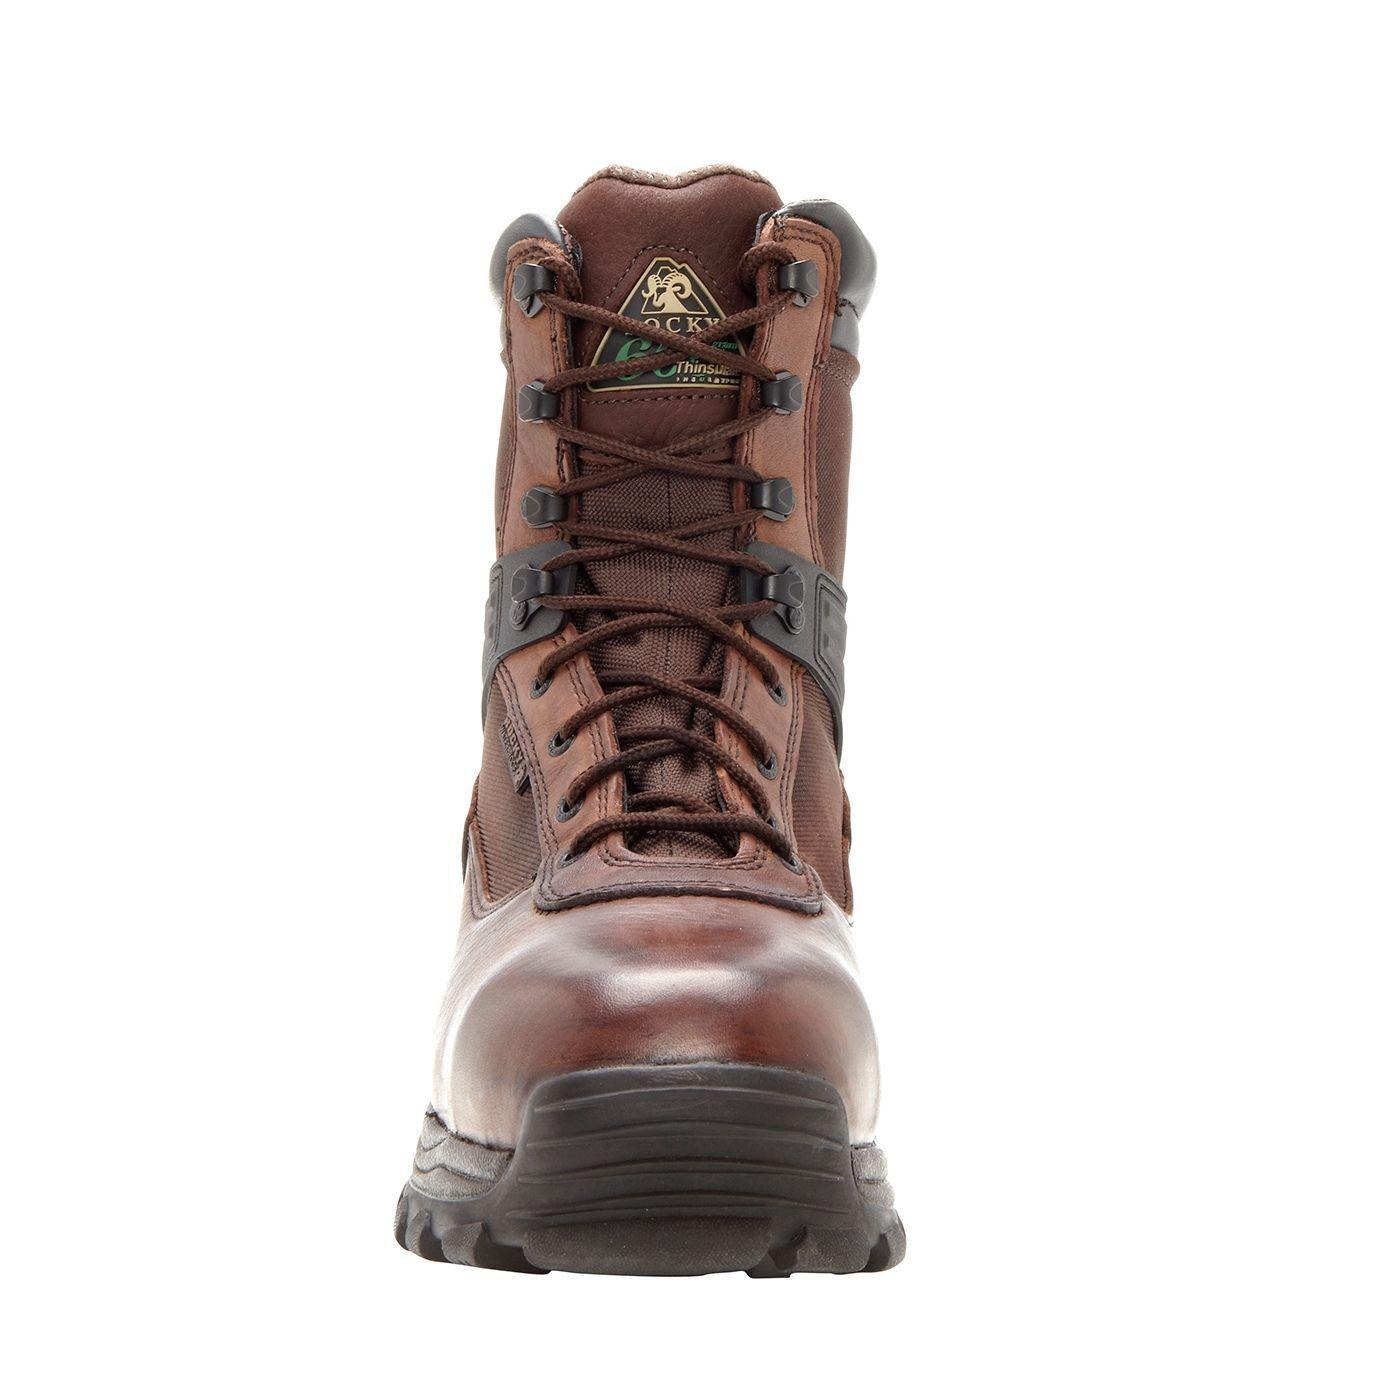 ROCKY SPORT UTILITY PRO ST WATERPROOF 600G INSULATED Stiefel Stiefel Stiefel FQ0006486  ALL GrößeS 202010